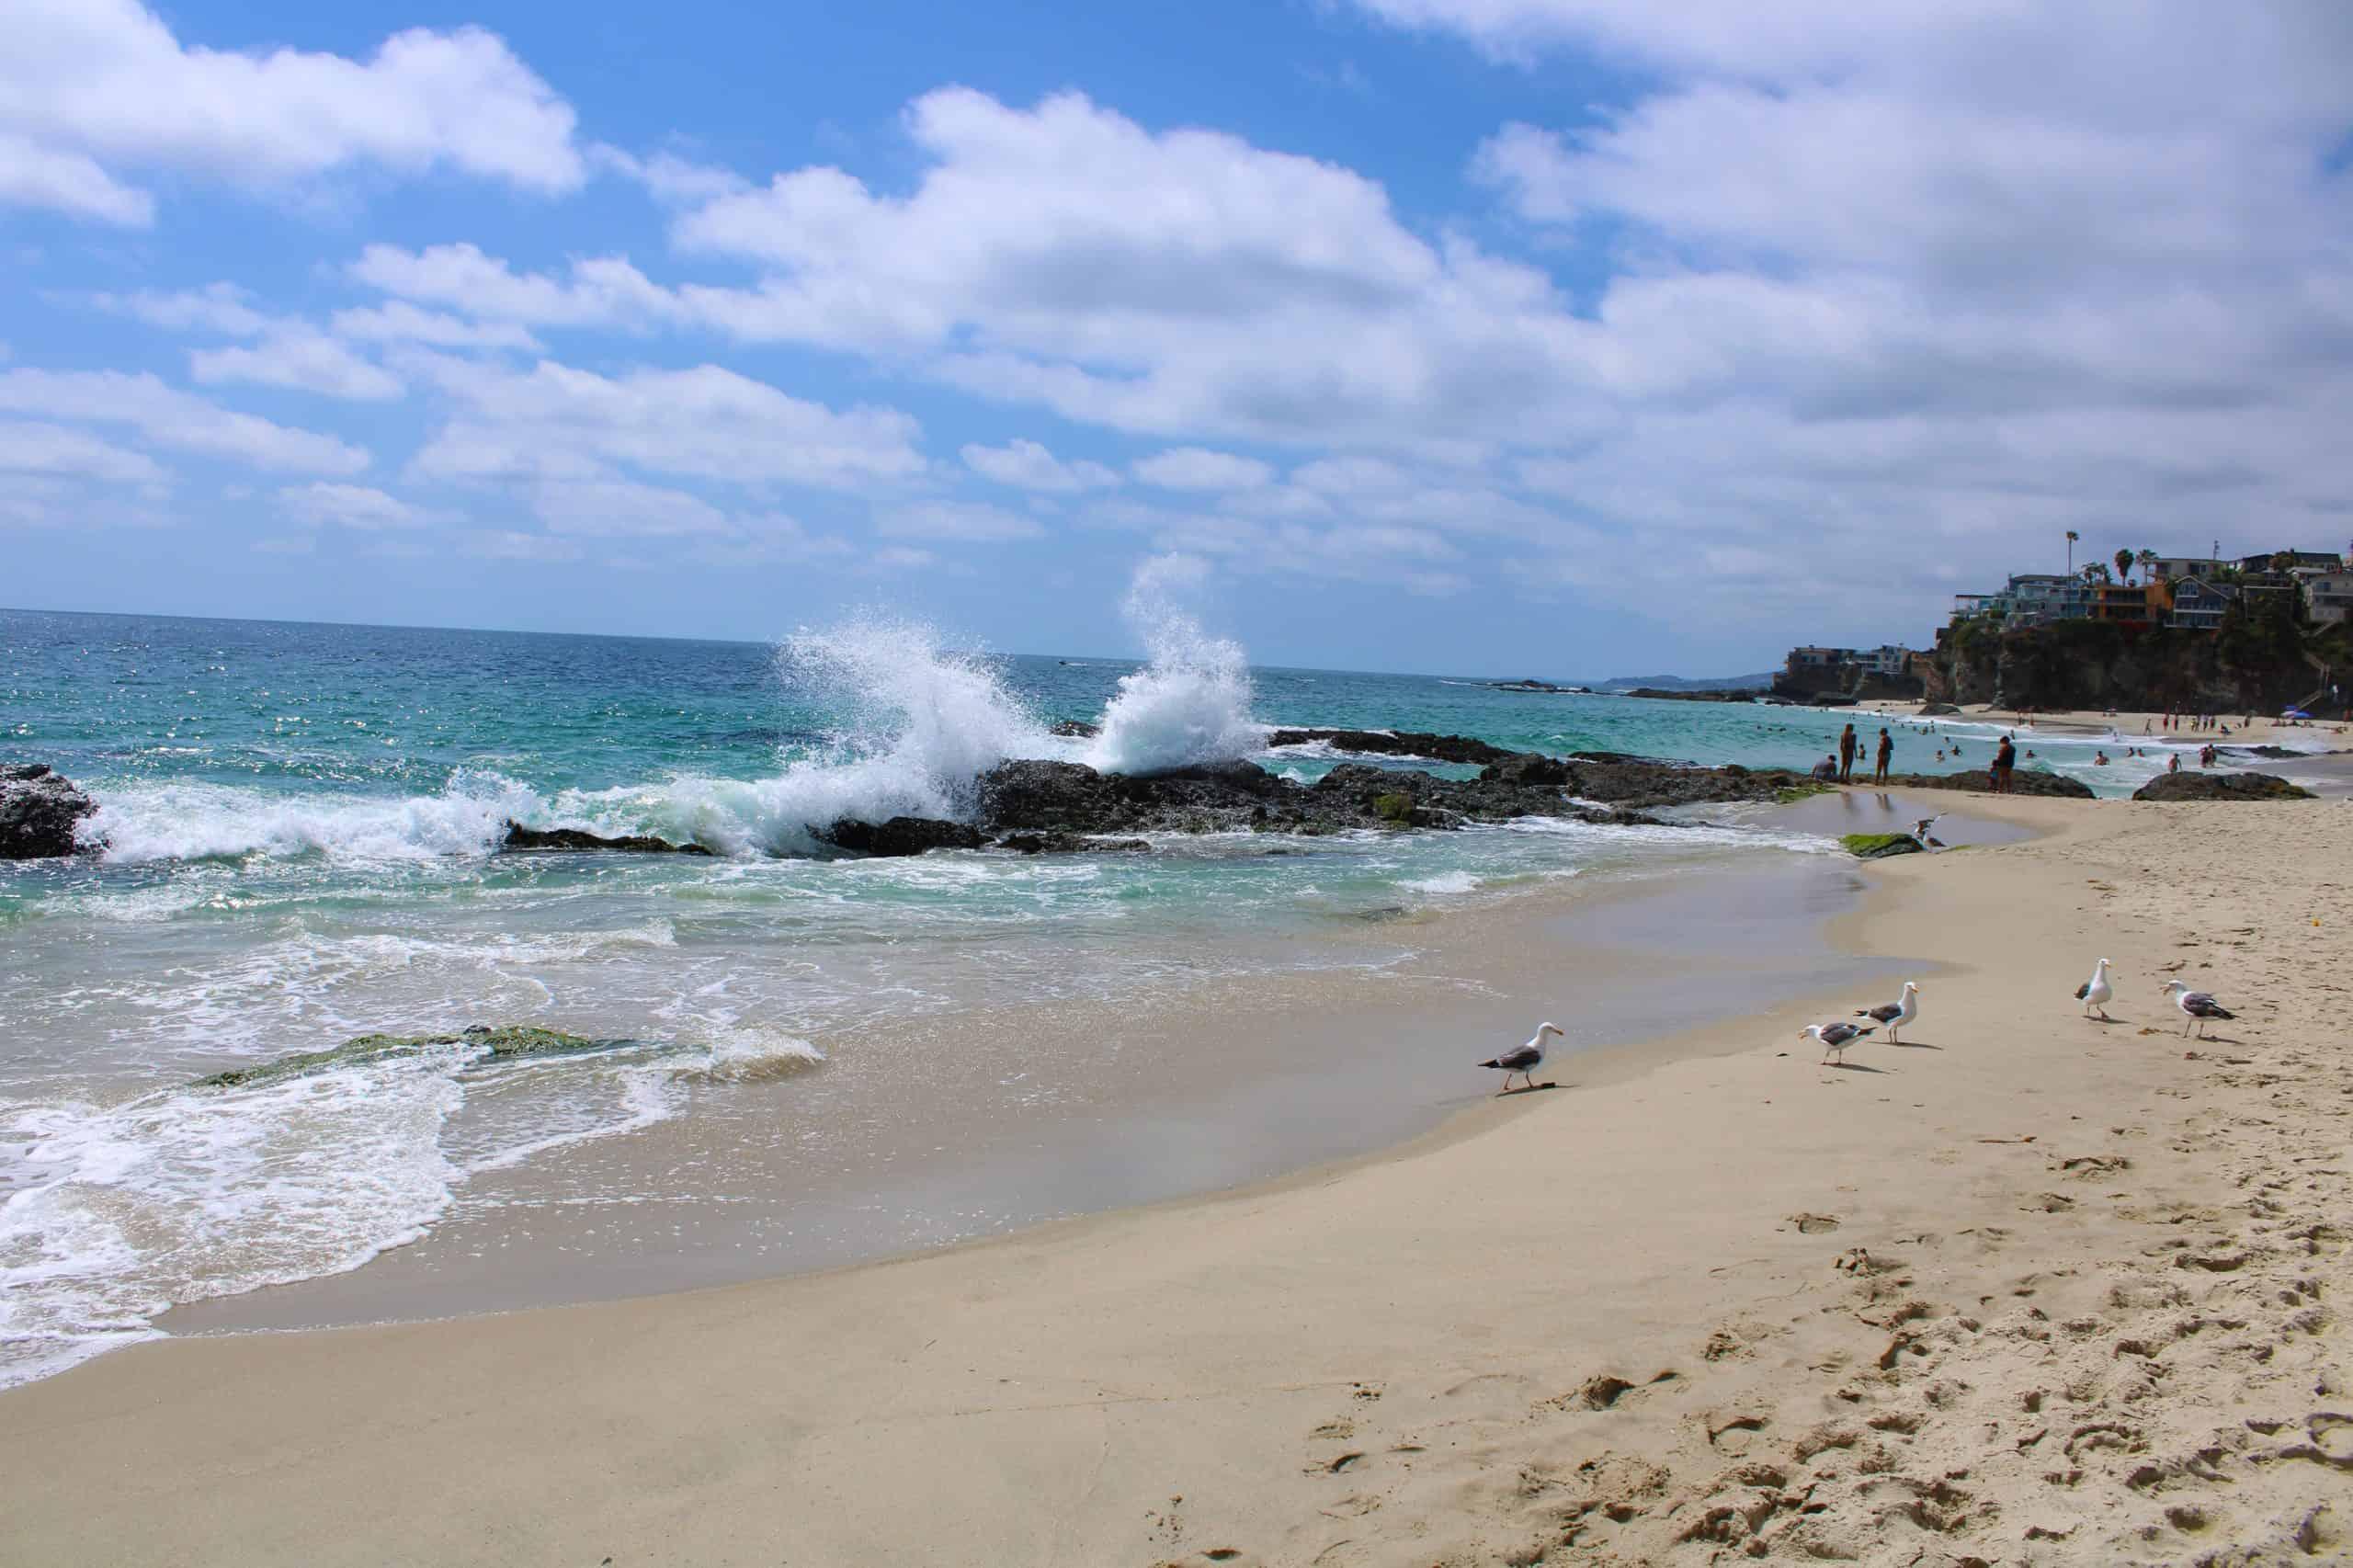 People enjoying 1000 Steps Beach in Southern California.